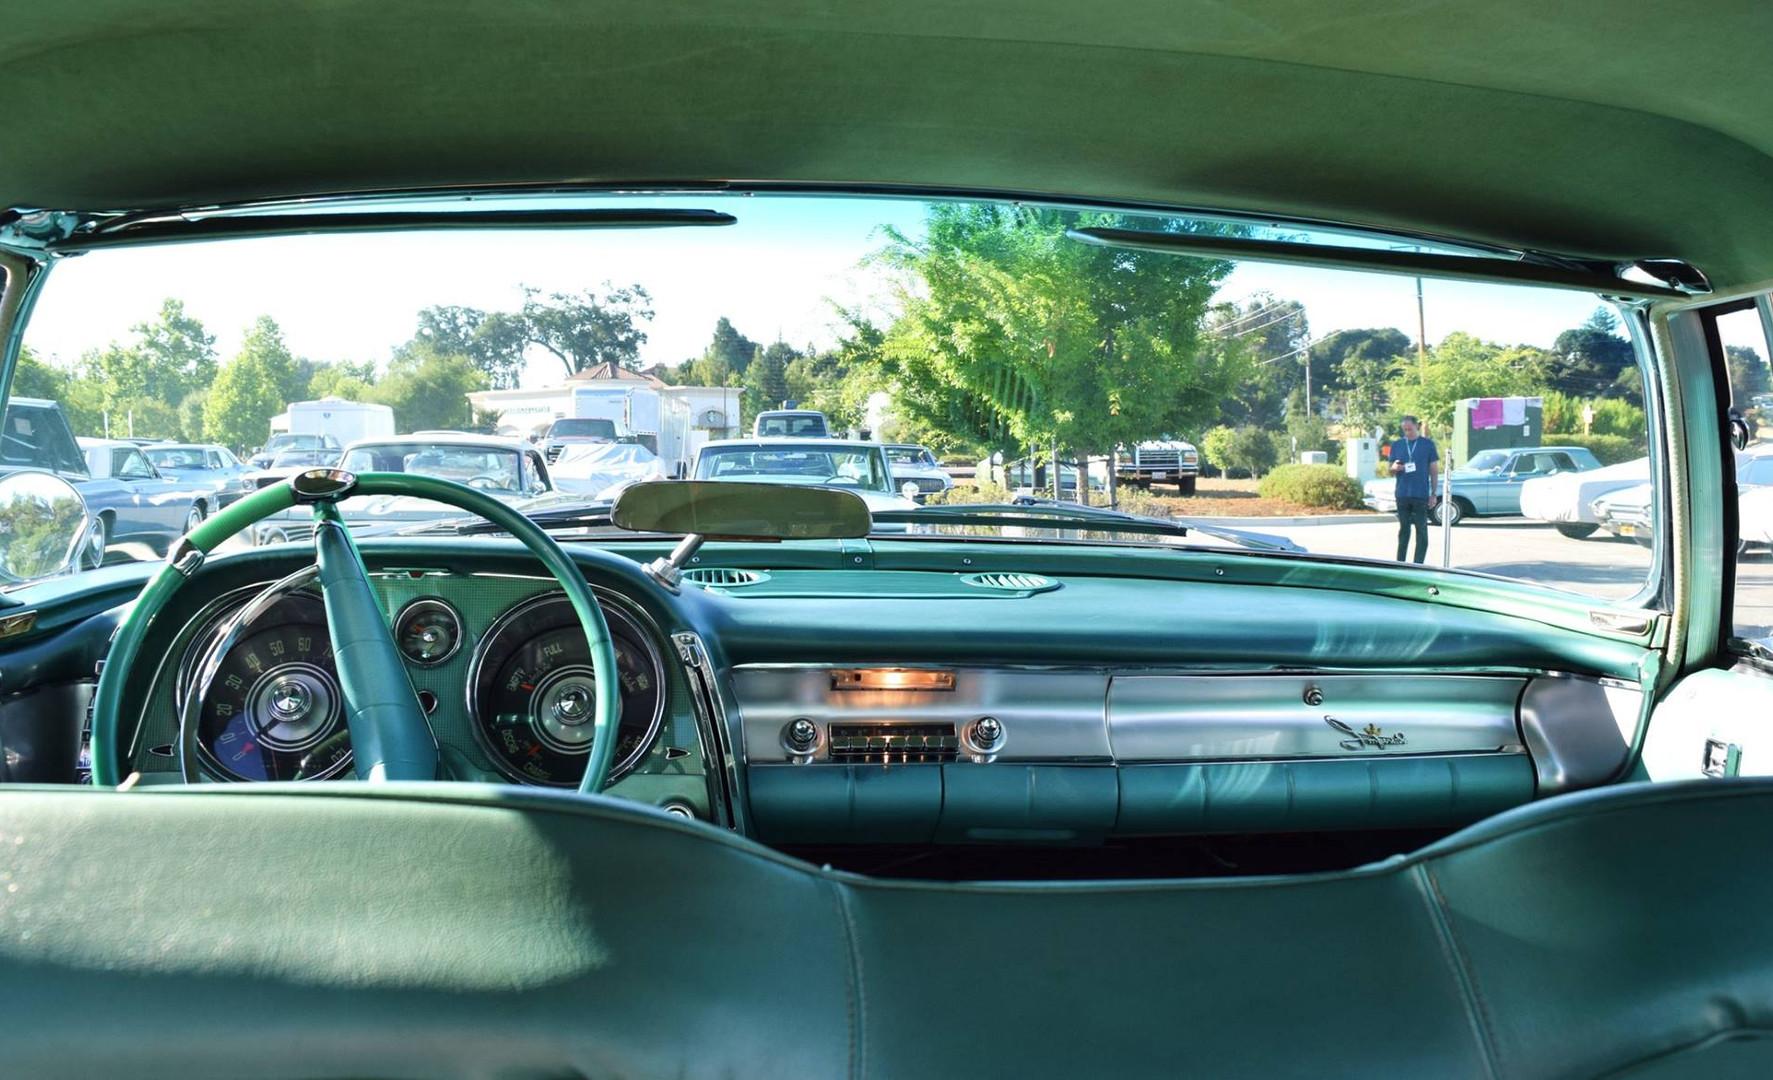 Car Show - Chrysler Imperial - Bill Peachee.jpg